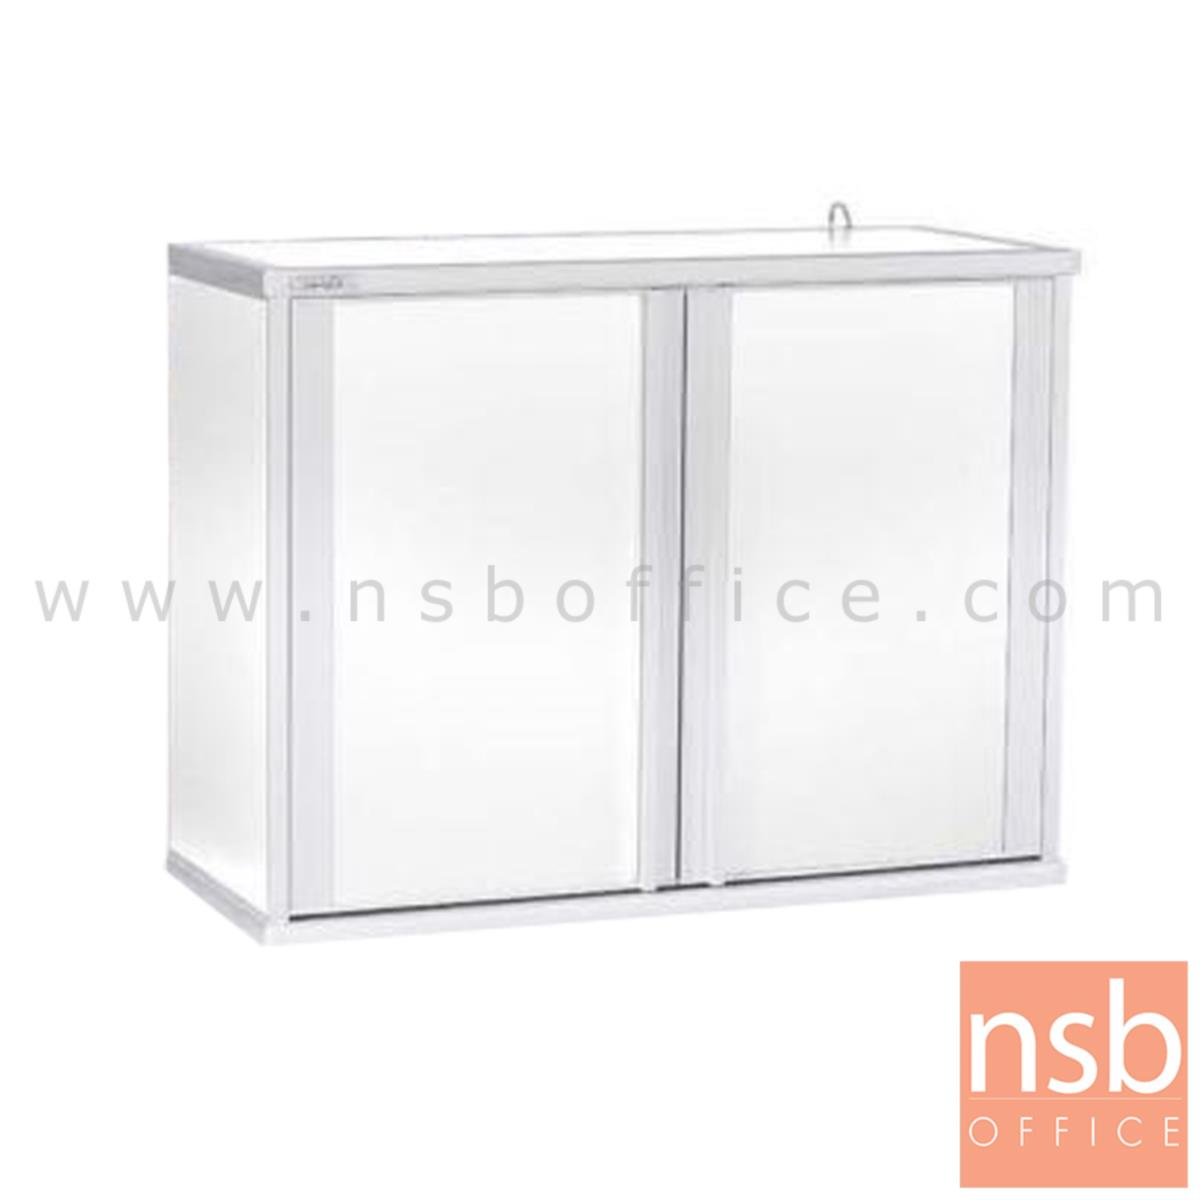 K09A028:ตู้ครัวแขวนเปิด 2 บาน ขนาด 106W cm. รุ่น HC1-AC 50